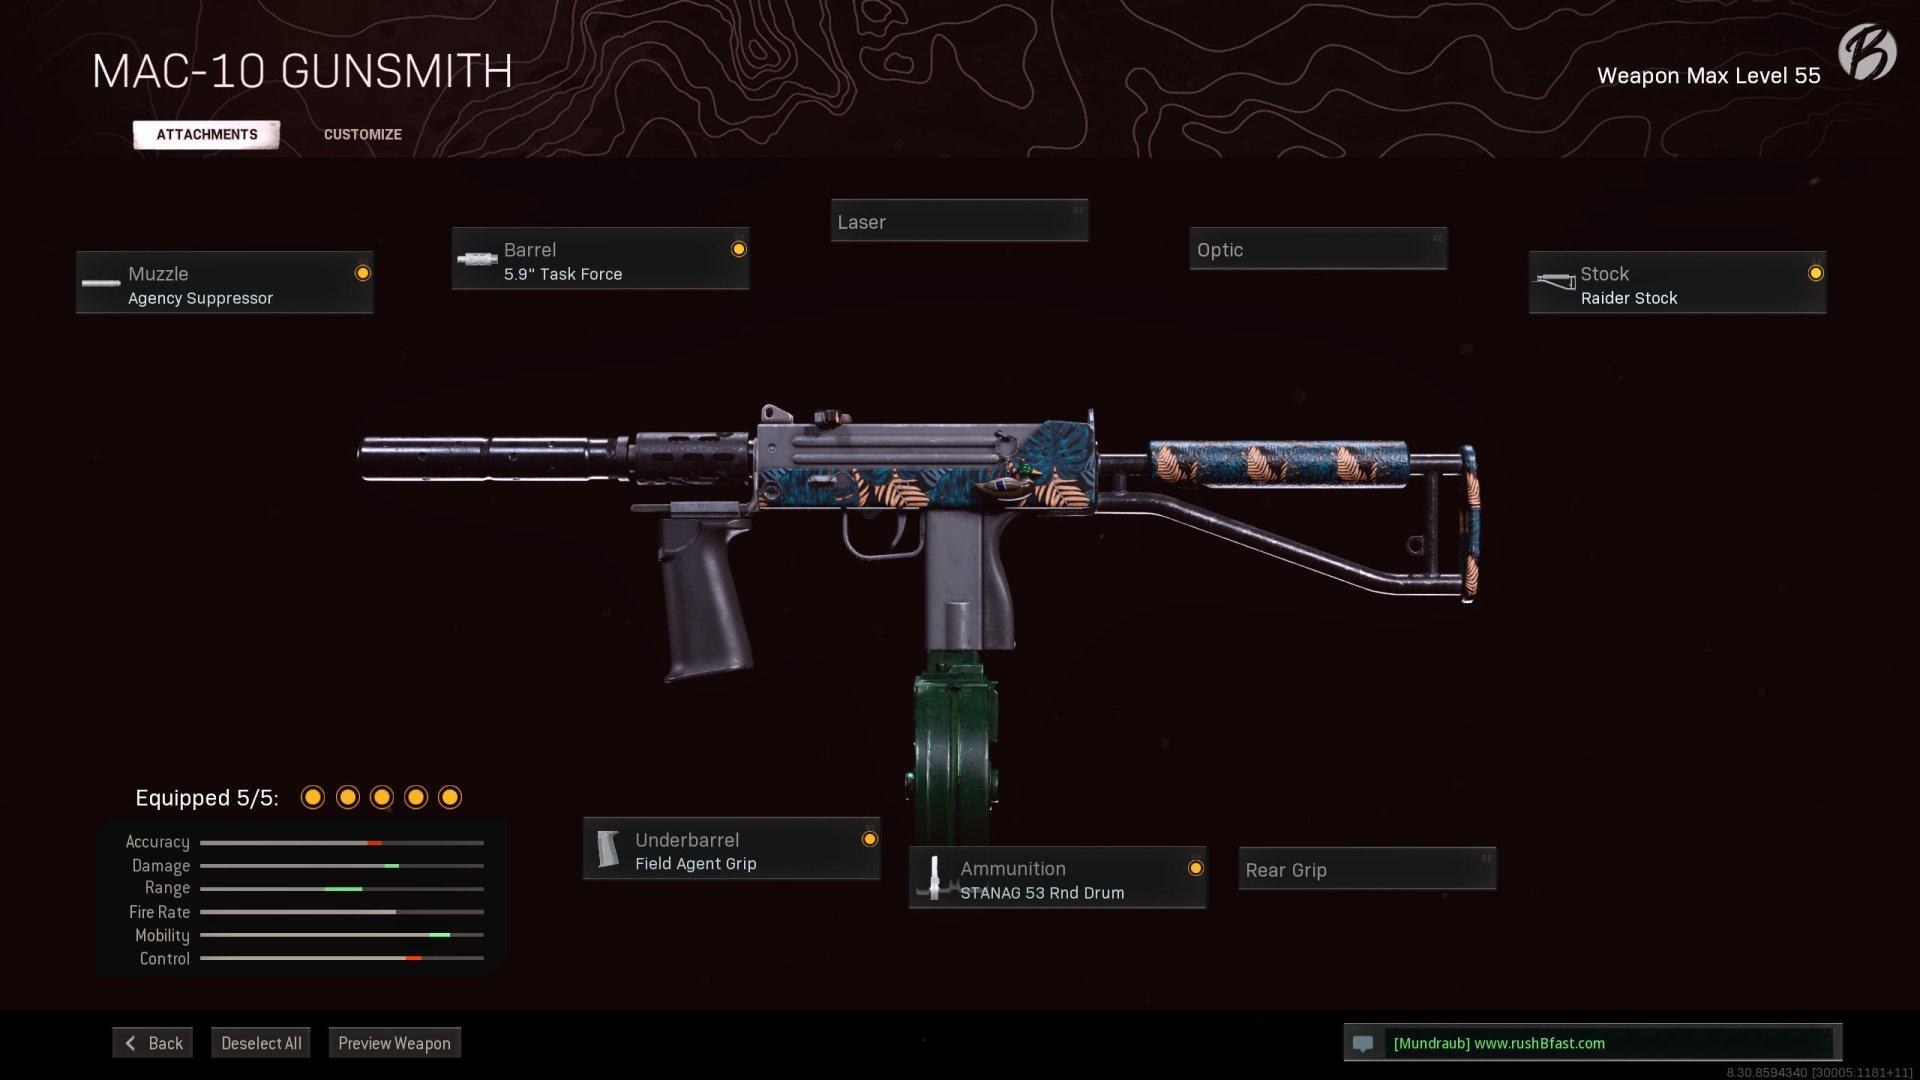 Call of Duty Warzone - Cold War Season 2 - MAC-10